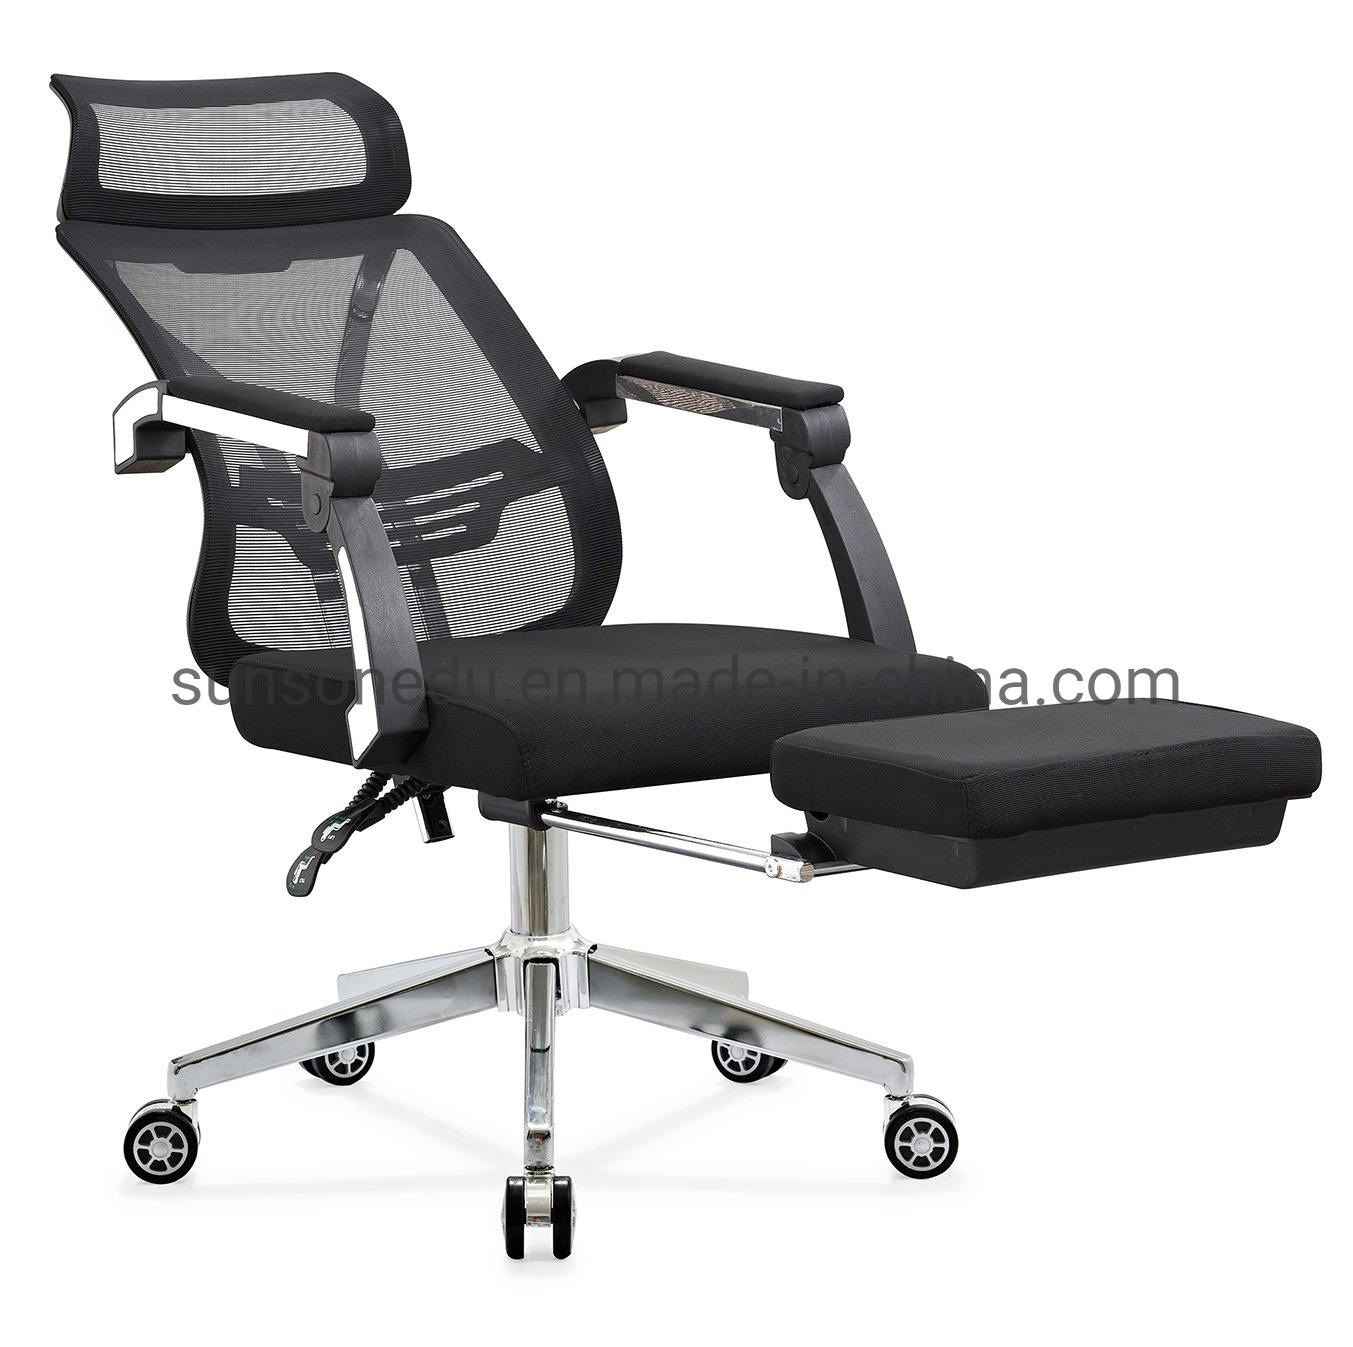 Hot Item Modern Cheap Ergonomic Lift Executive Mesh Office Chair With Wheels